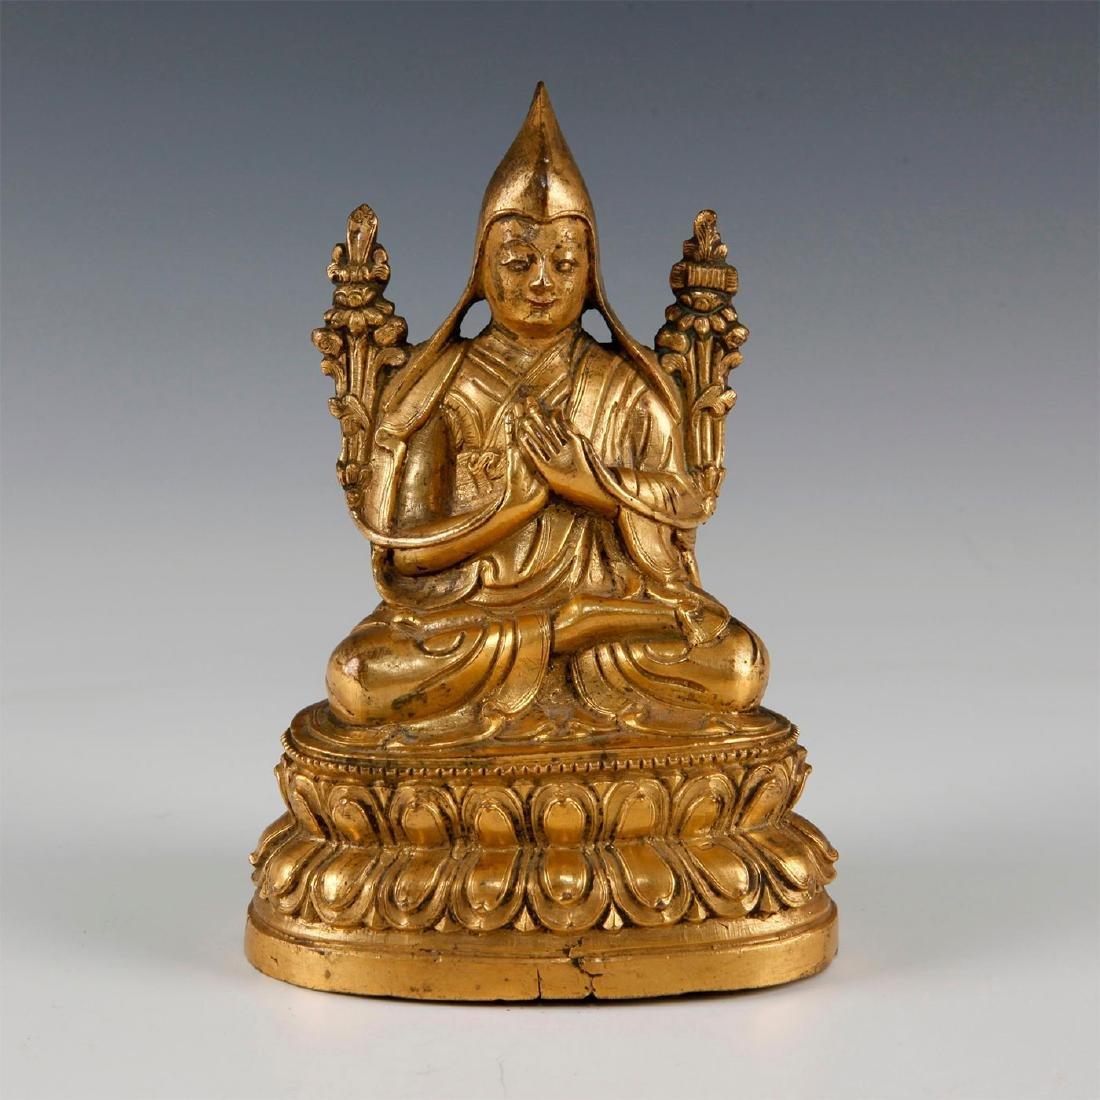 18TH CENTURY MOLDED GILT BRONZE TIBETAN LAMA FIGURE